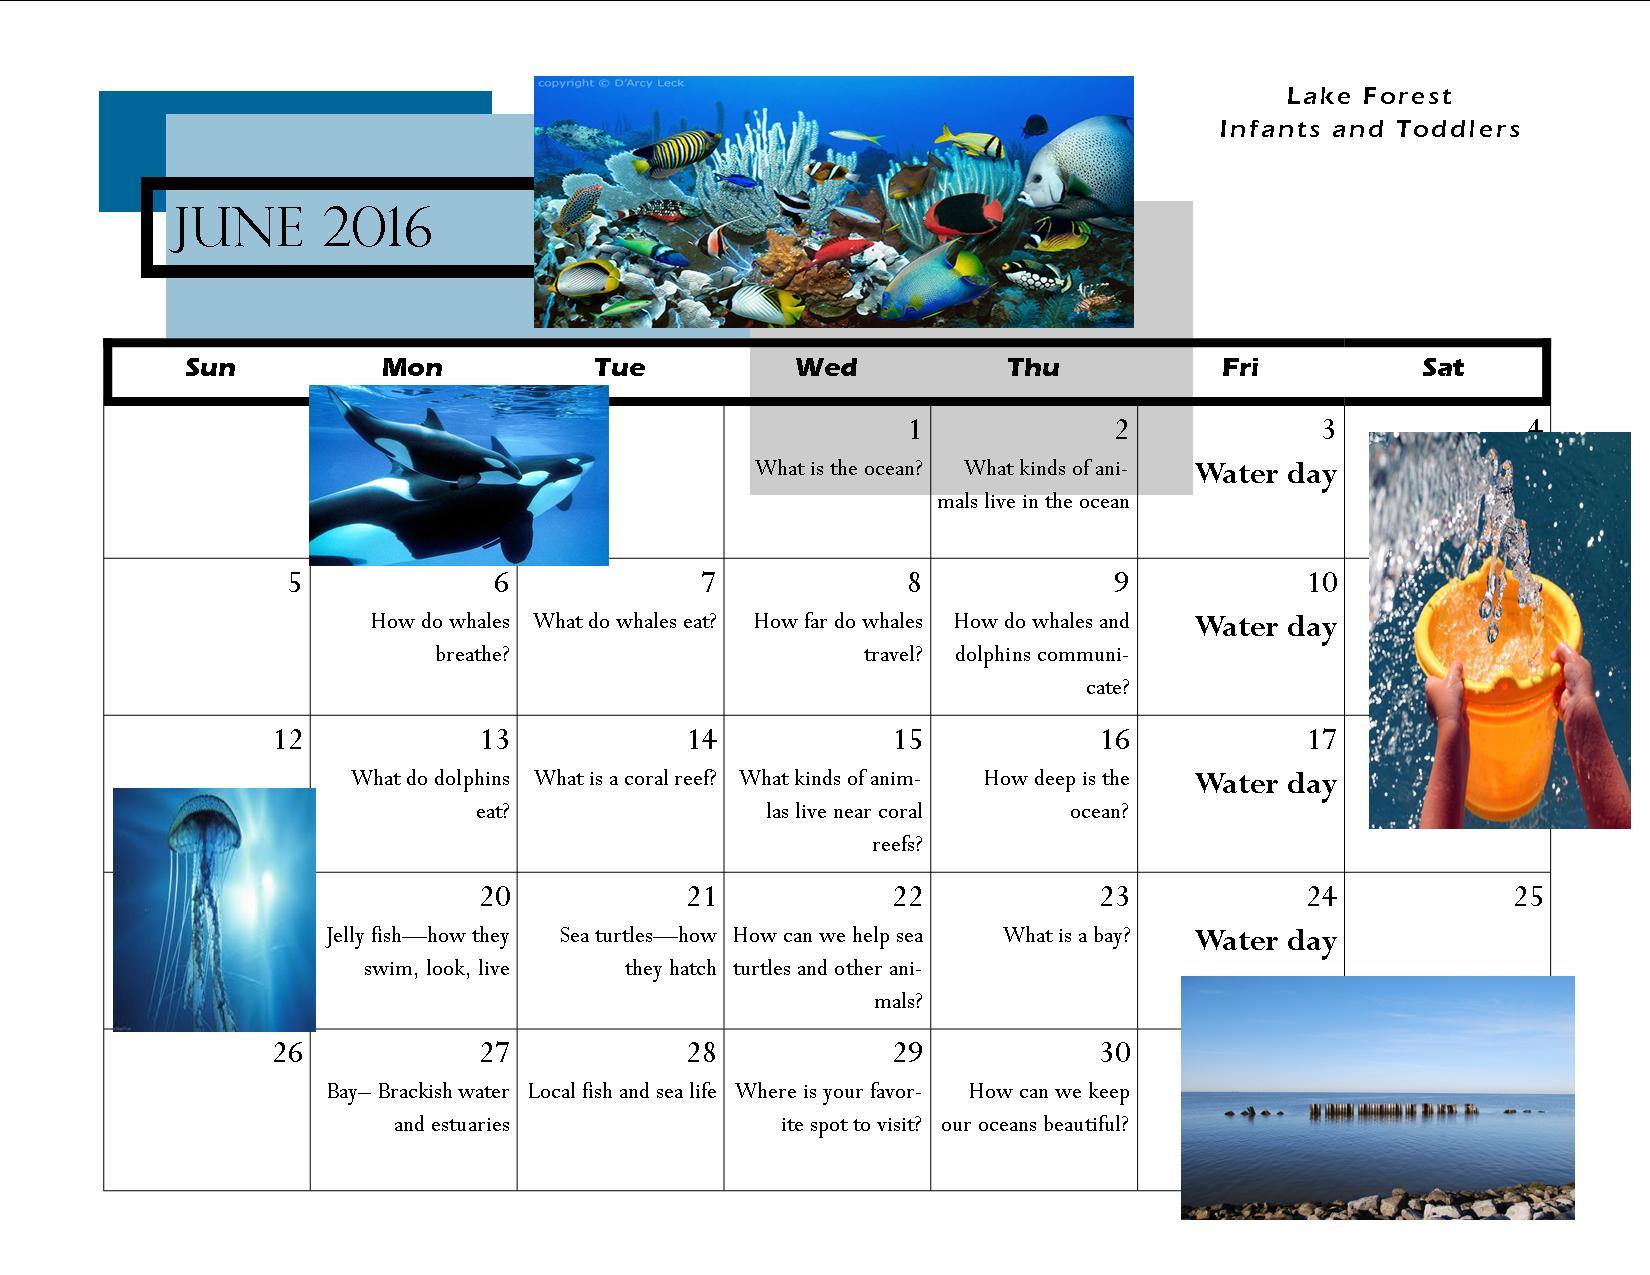 1024114-LF_infant_June_2016_calendar